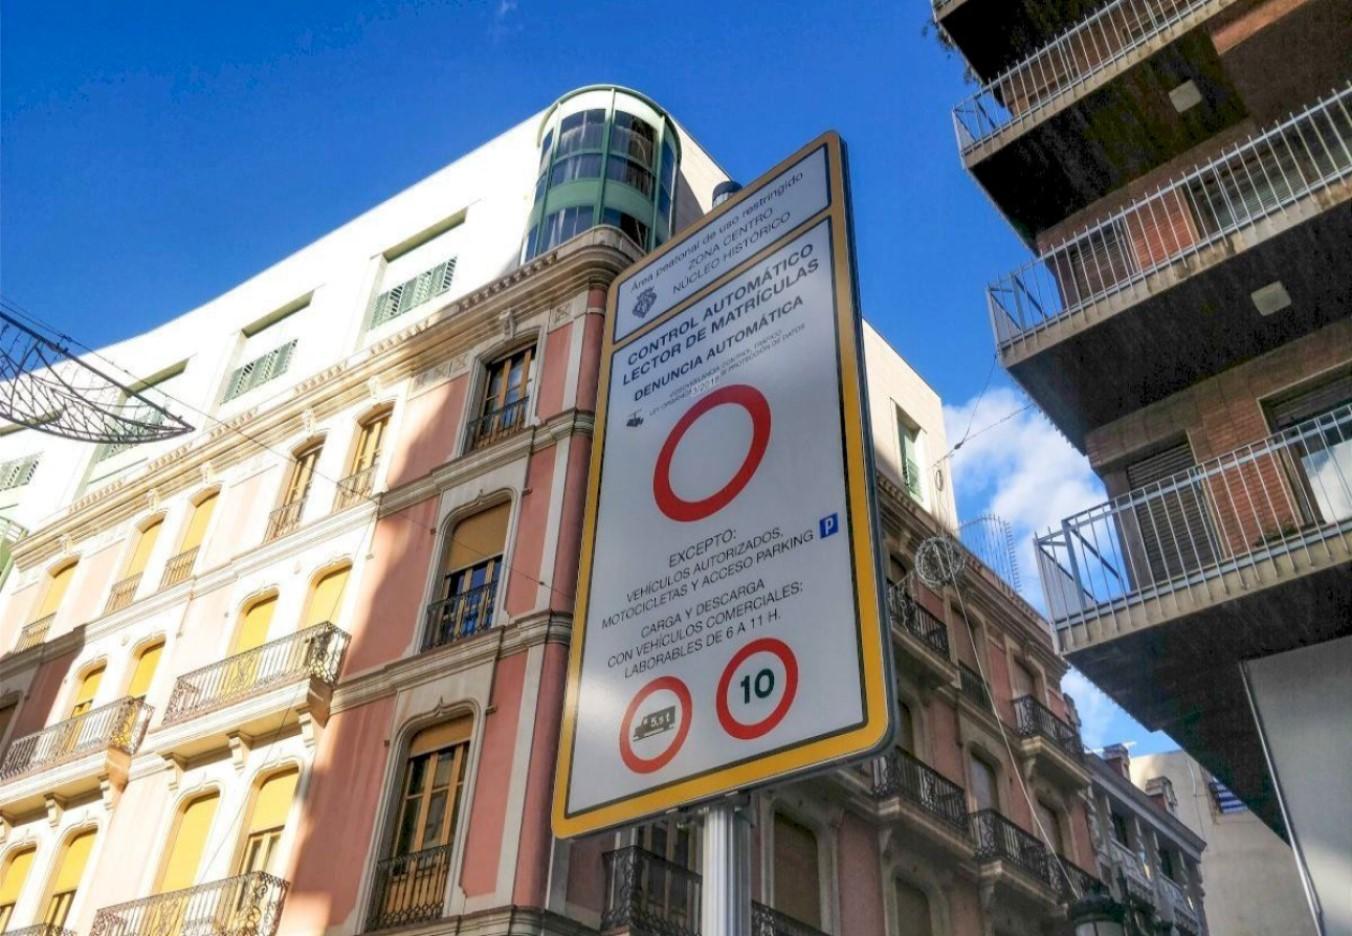 Vuelven las cámaras a los accesos al centro de Castelló